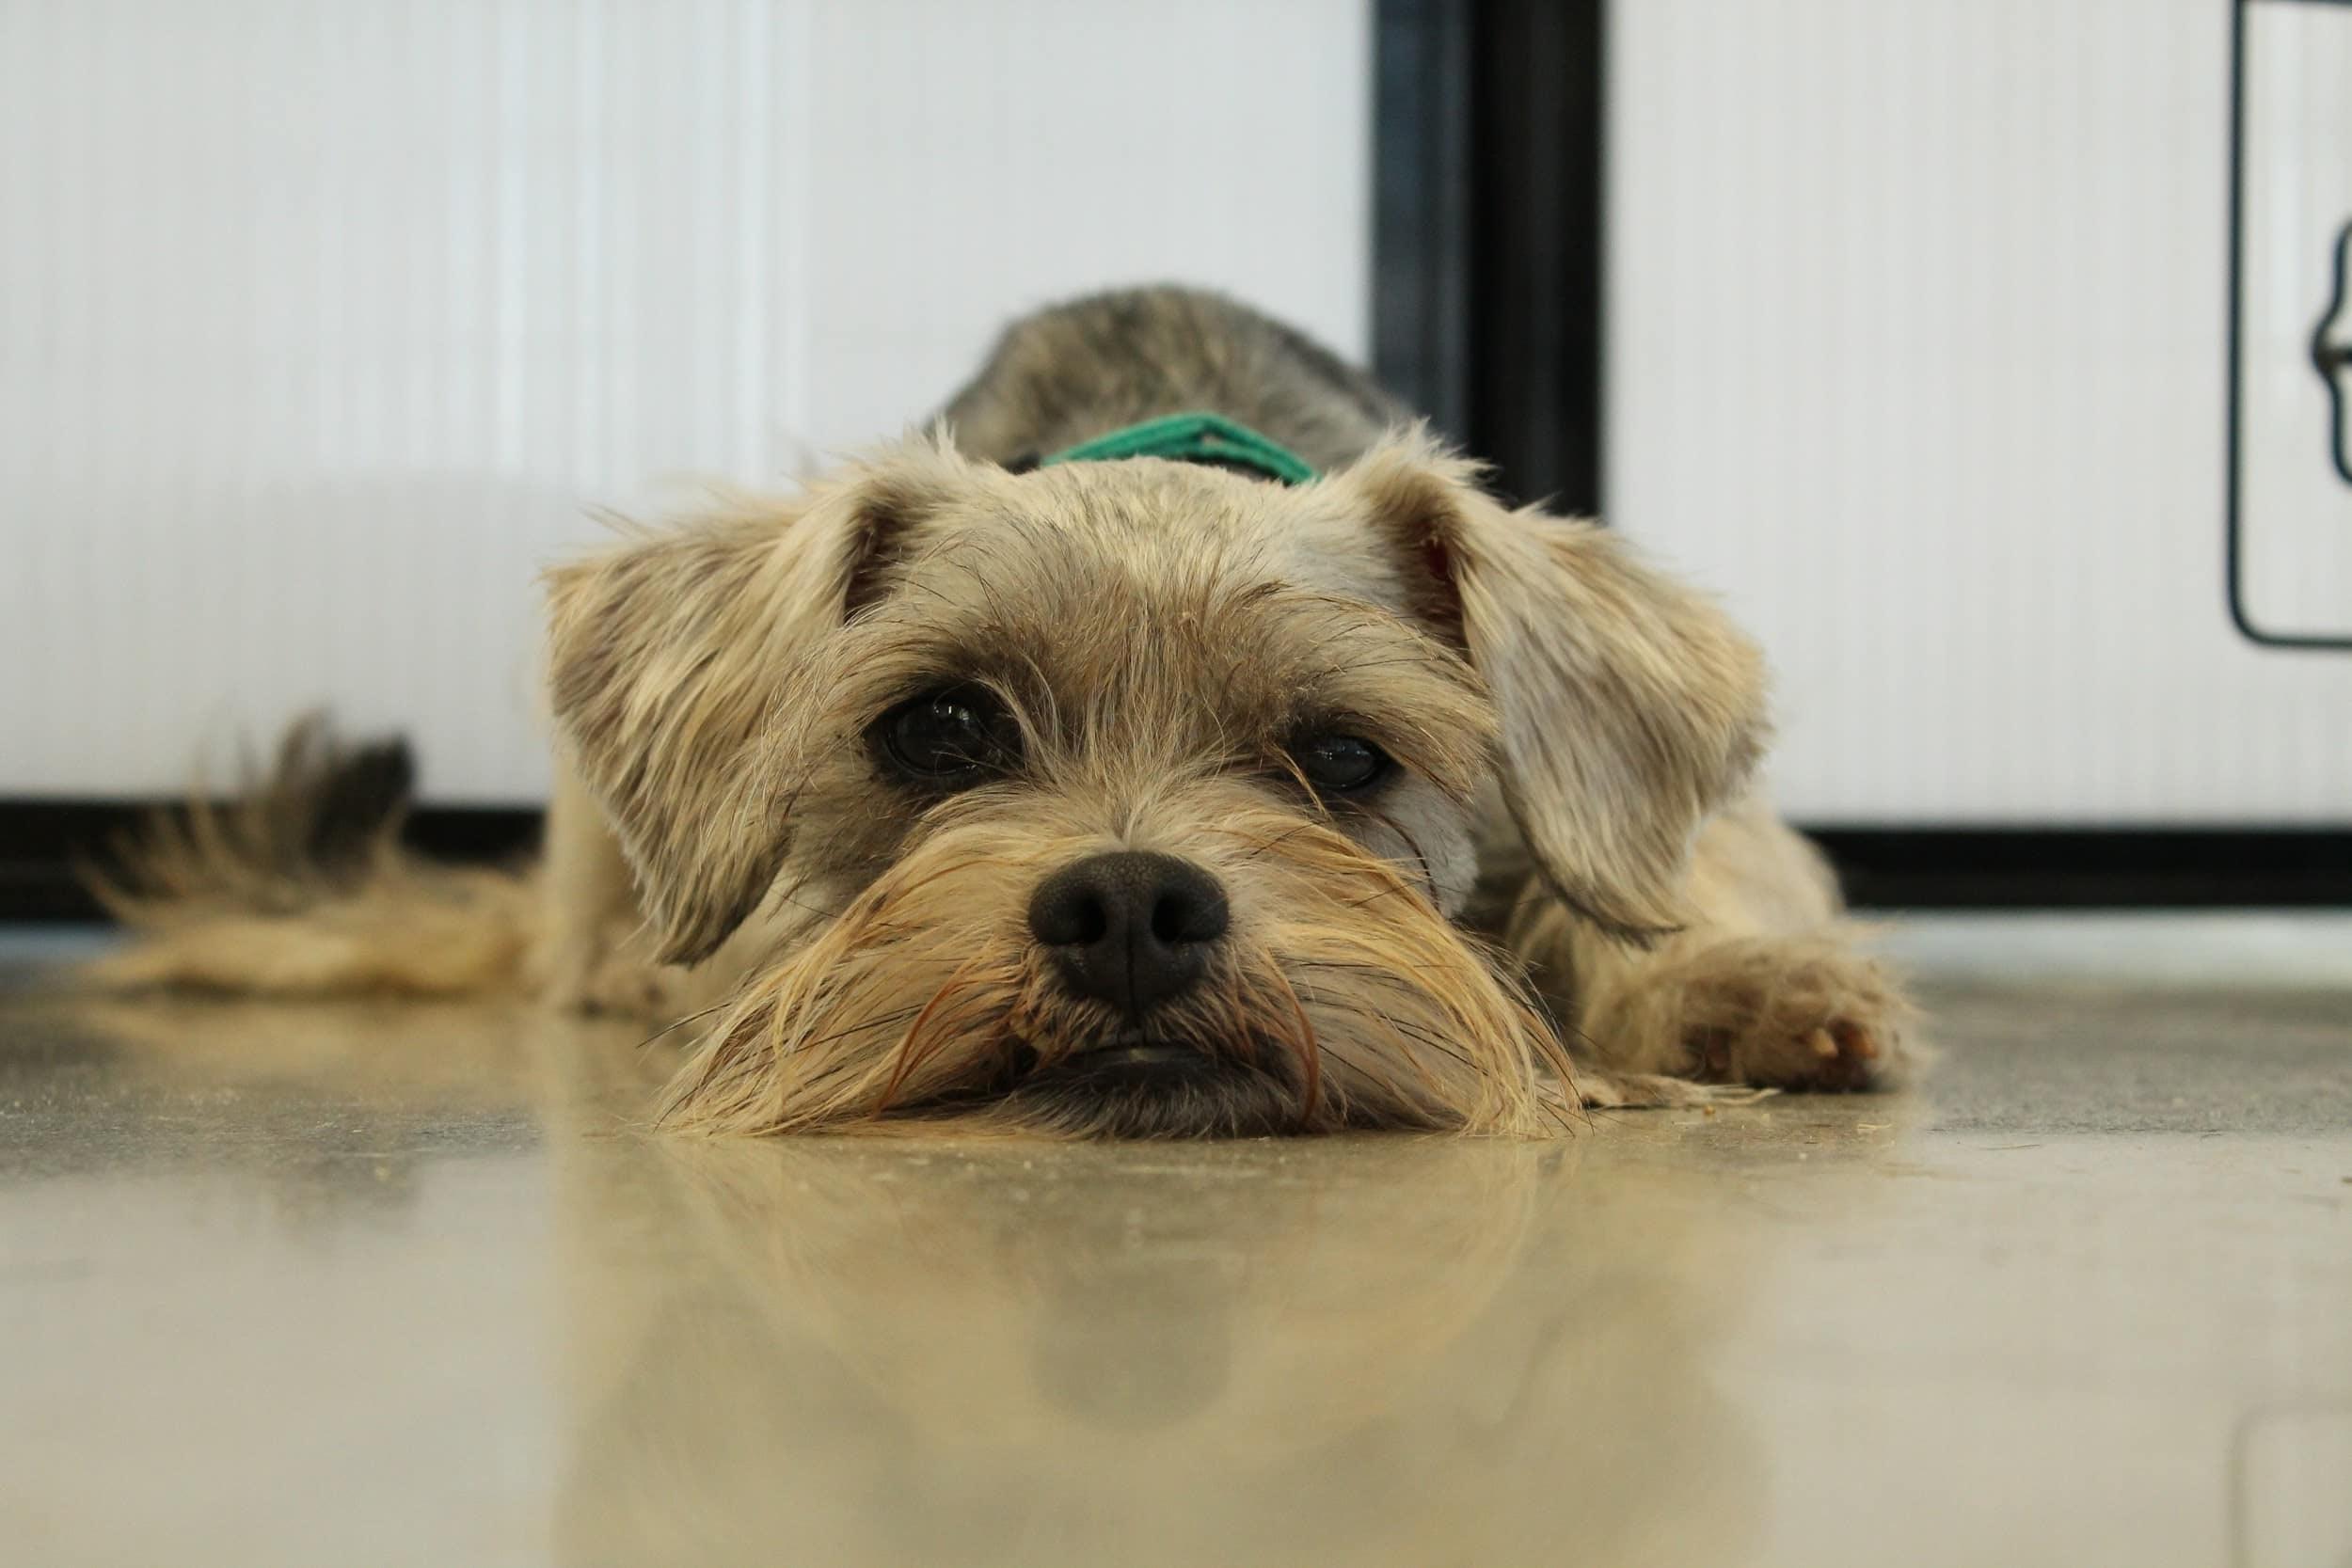 Sightly Ways To Keep Your Dog Active Blog Jenna Marbles Dogs Swim Jenna Marbles Dog Iq Test bark post Jenna Marbles Dog